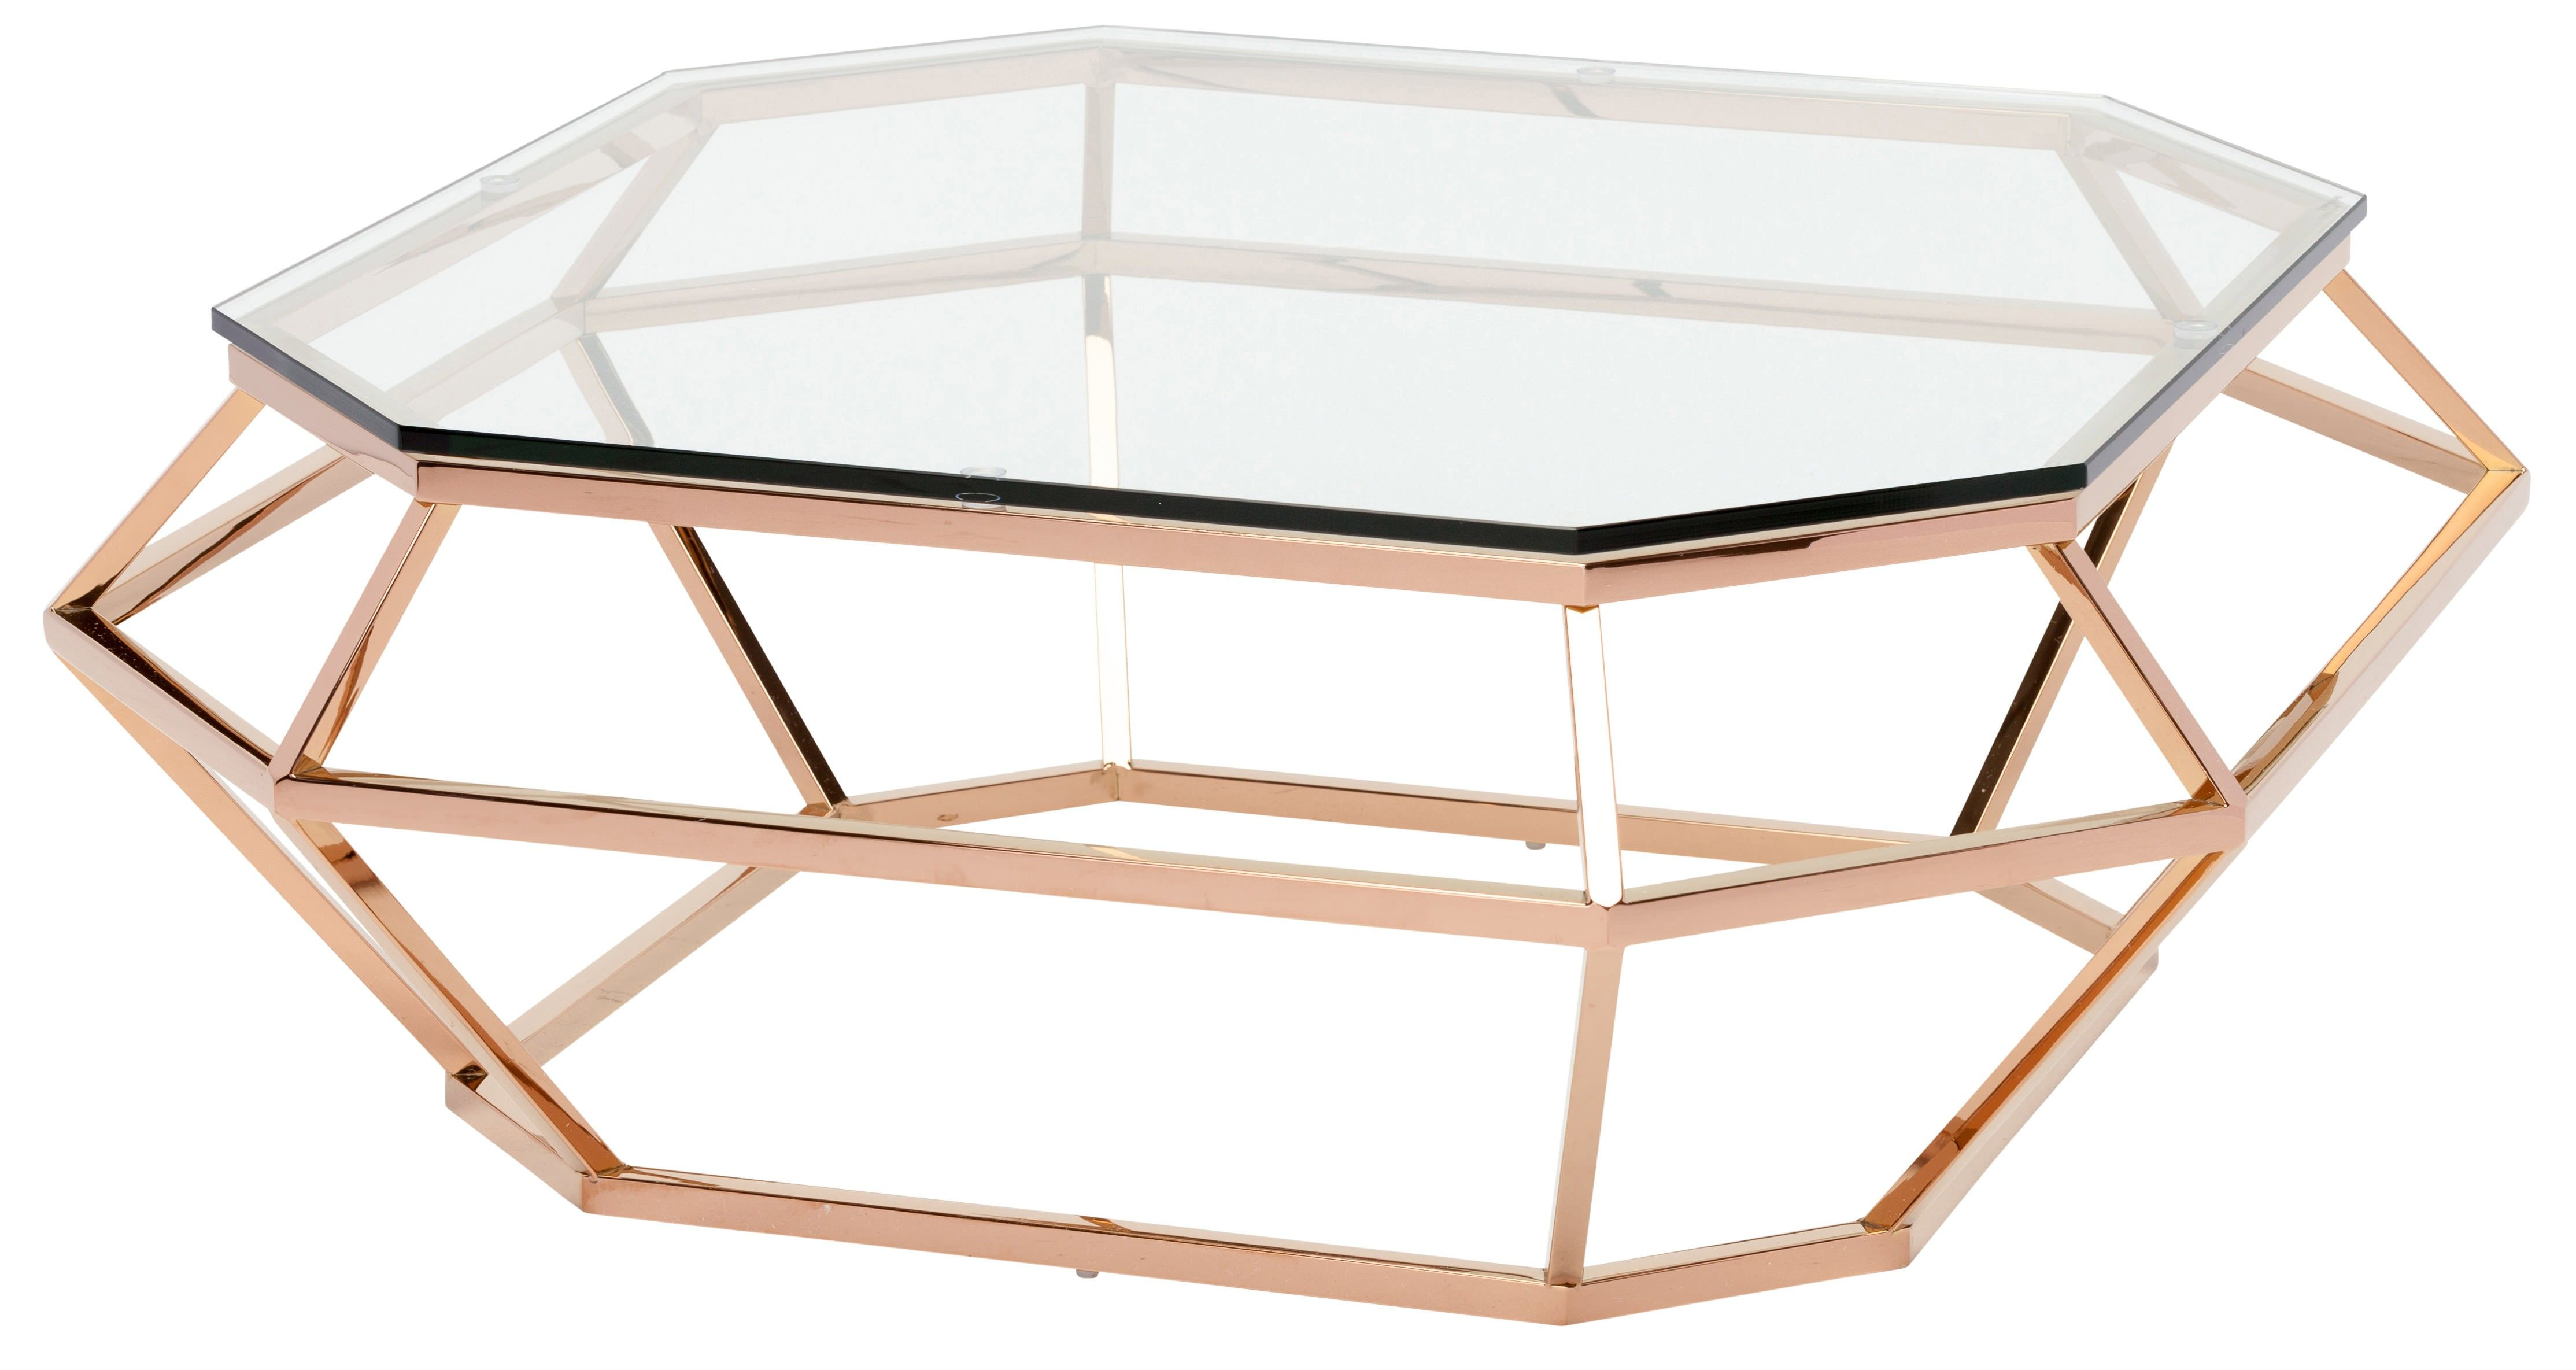 Diamond Coffee Table Multiple Colors By Nuevo Living Hgsx180 Hgsx182 Nuevo Living Gold Glass Coffee Table Coffee Table Square Gold Coffee Table [ 2369 x 4455 Pixel ]